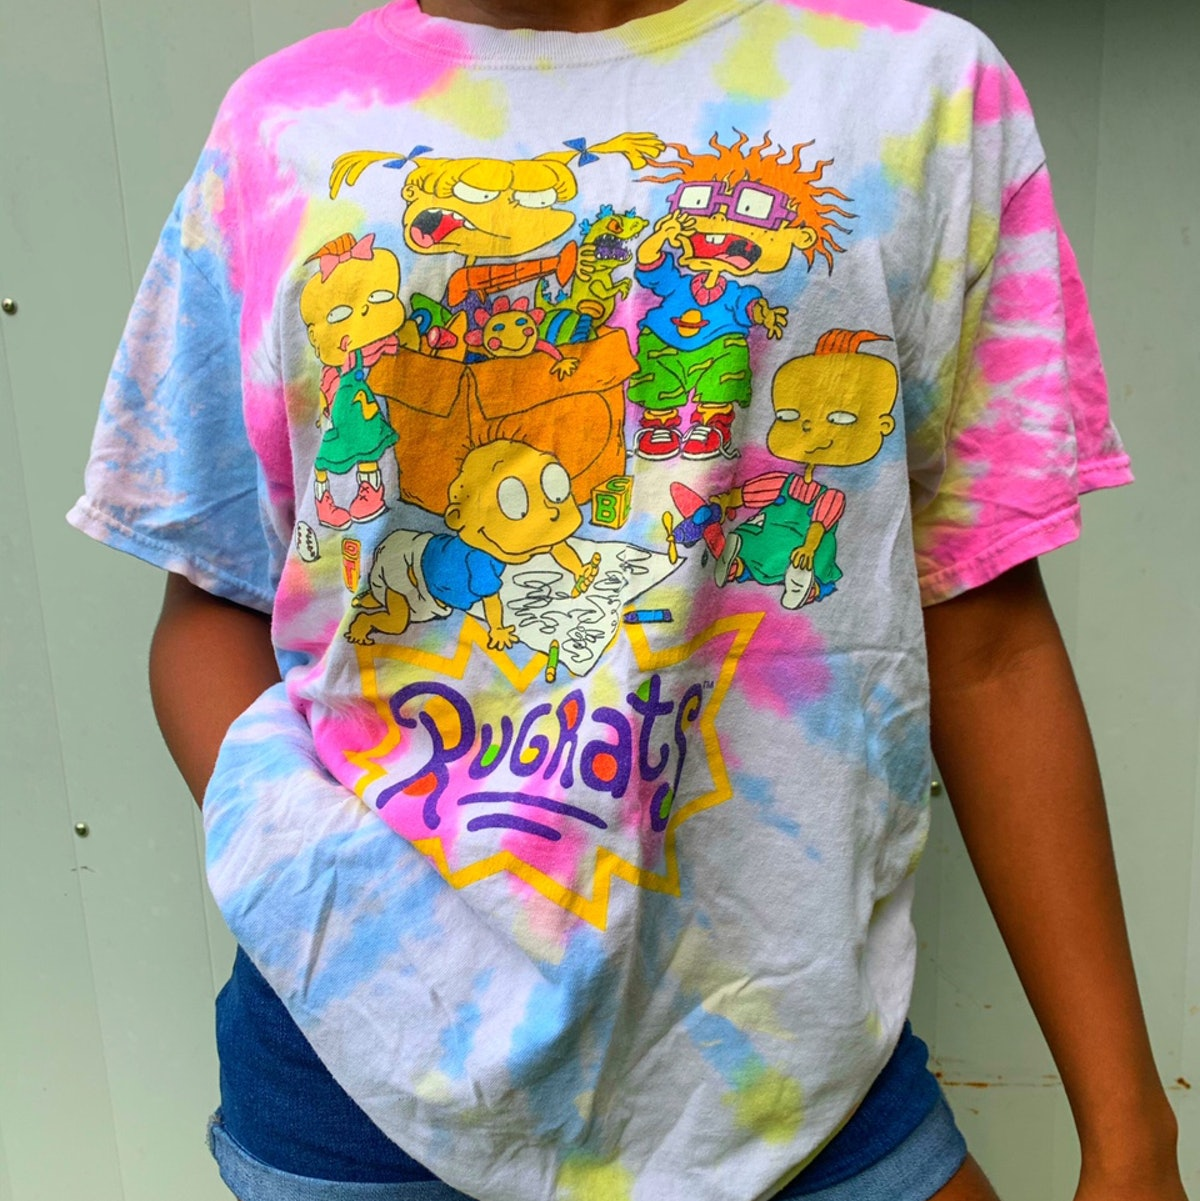 @chibrokemyheart 'Rugrats' Tie-Dye Shirt